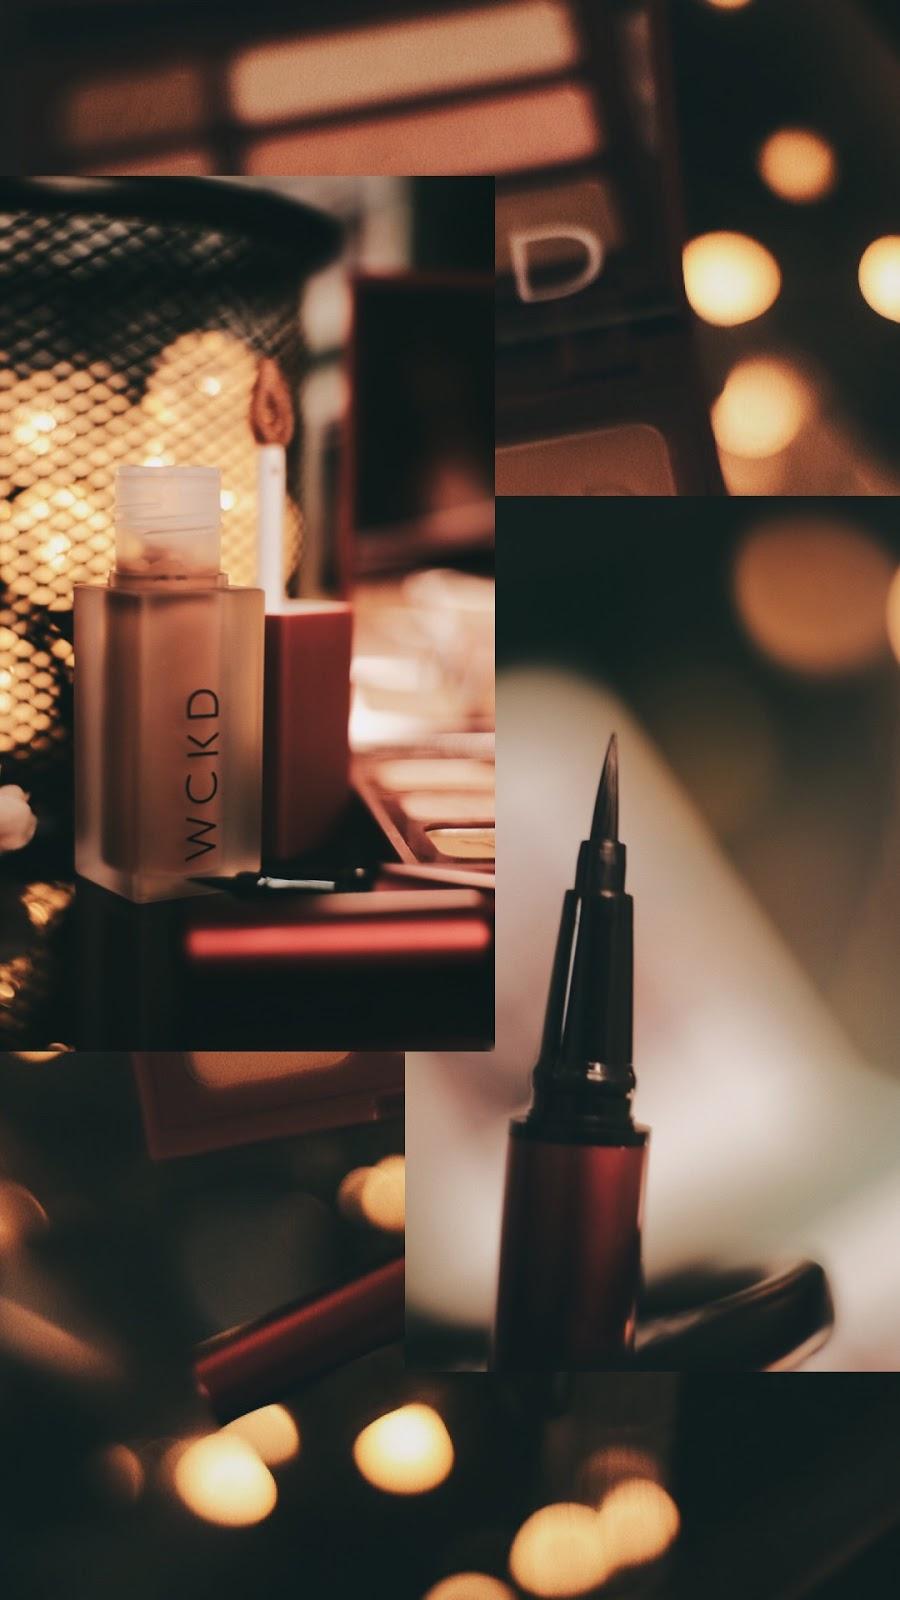 WCKD-Face-Palette-Lip-Matte-Power-Flick-Eyeliner-Review